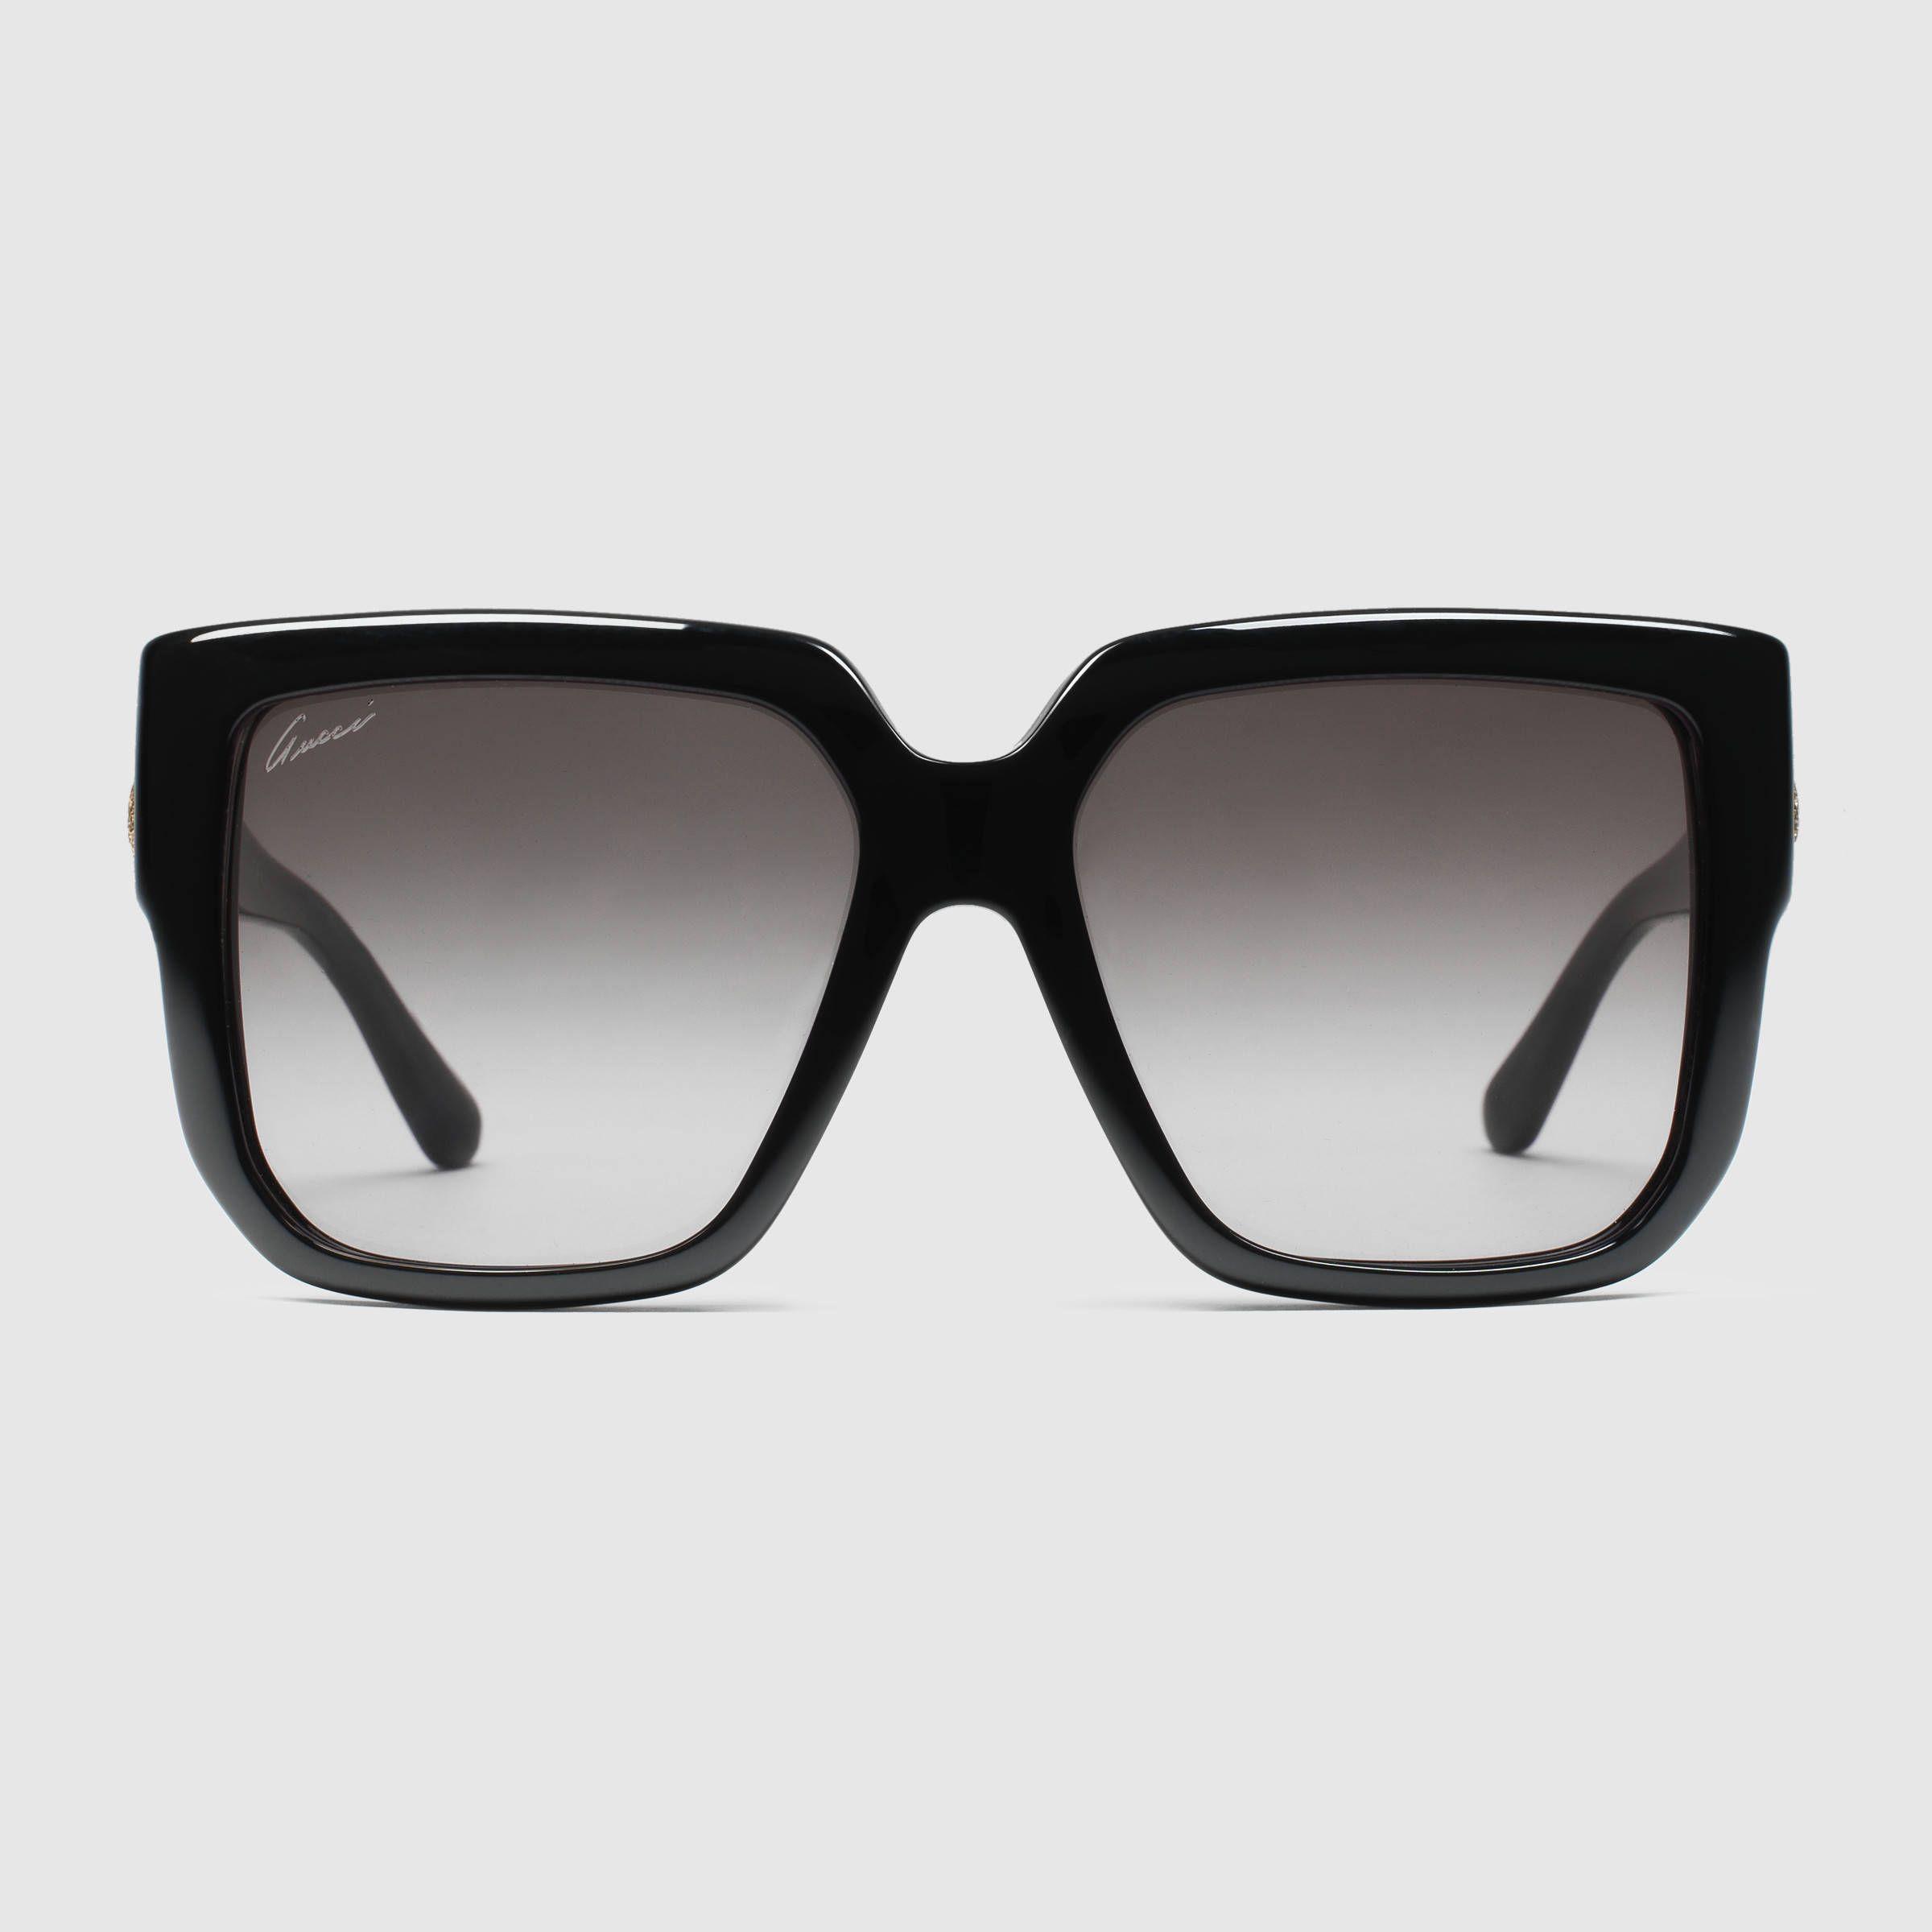 Gucci Ladies Glasses Frame : Gucci Women - Oversized square-frame sunglasses ...